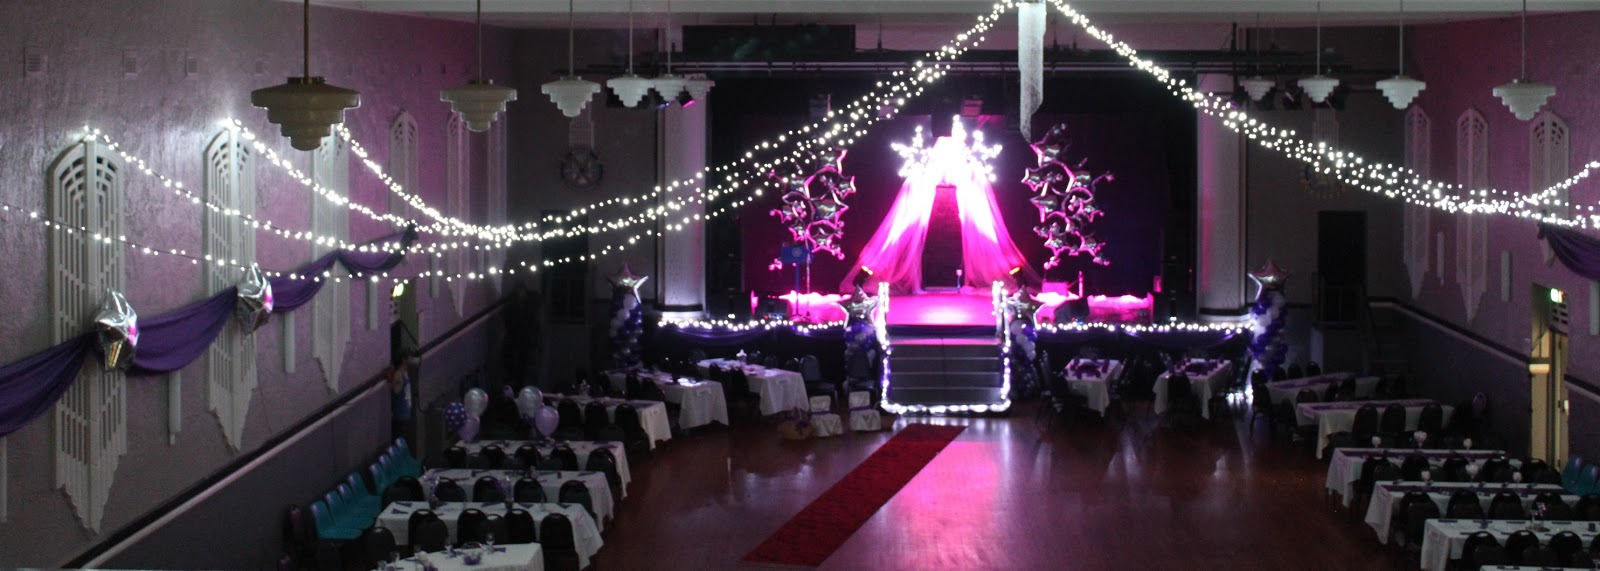 Enchanted Events And Balloons Rotary Debutante Ball